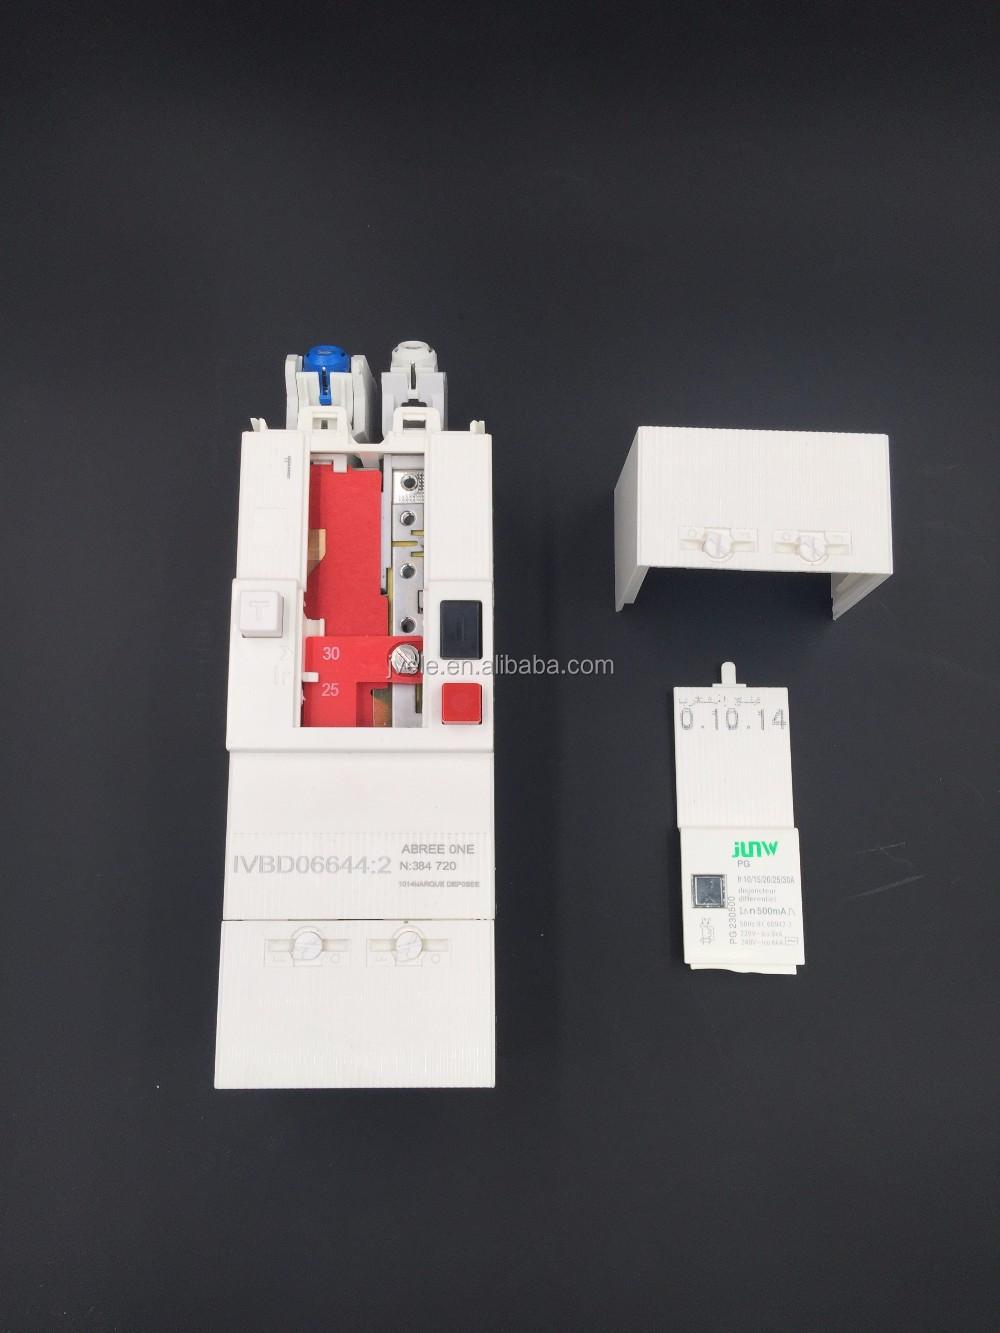 Africain La Terre Type De Mini Disjoncteur Mcb Disjoncteur